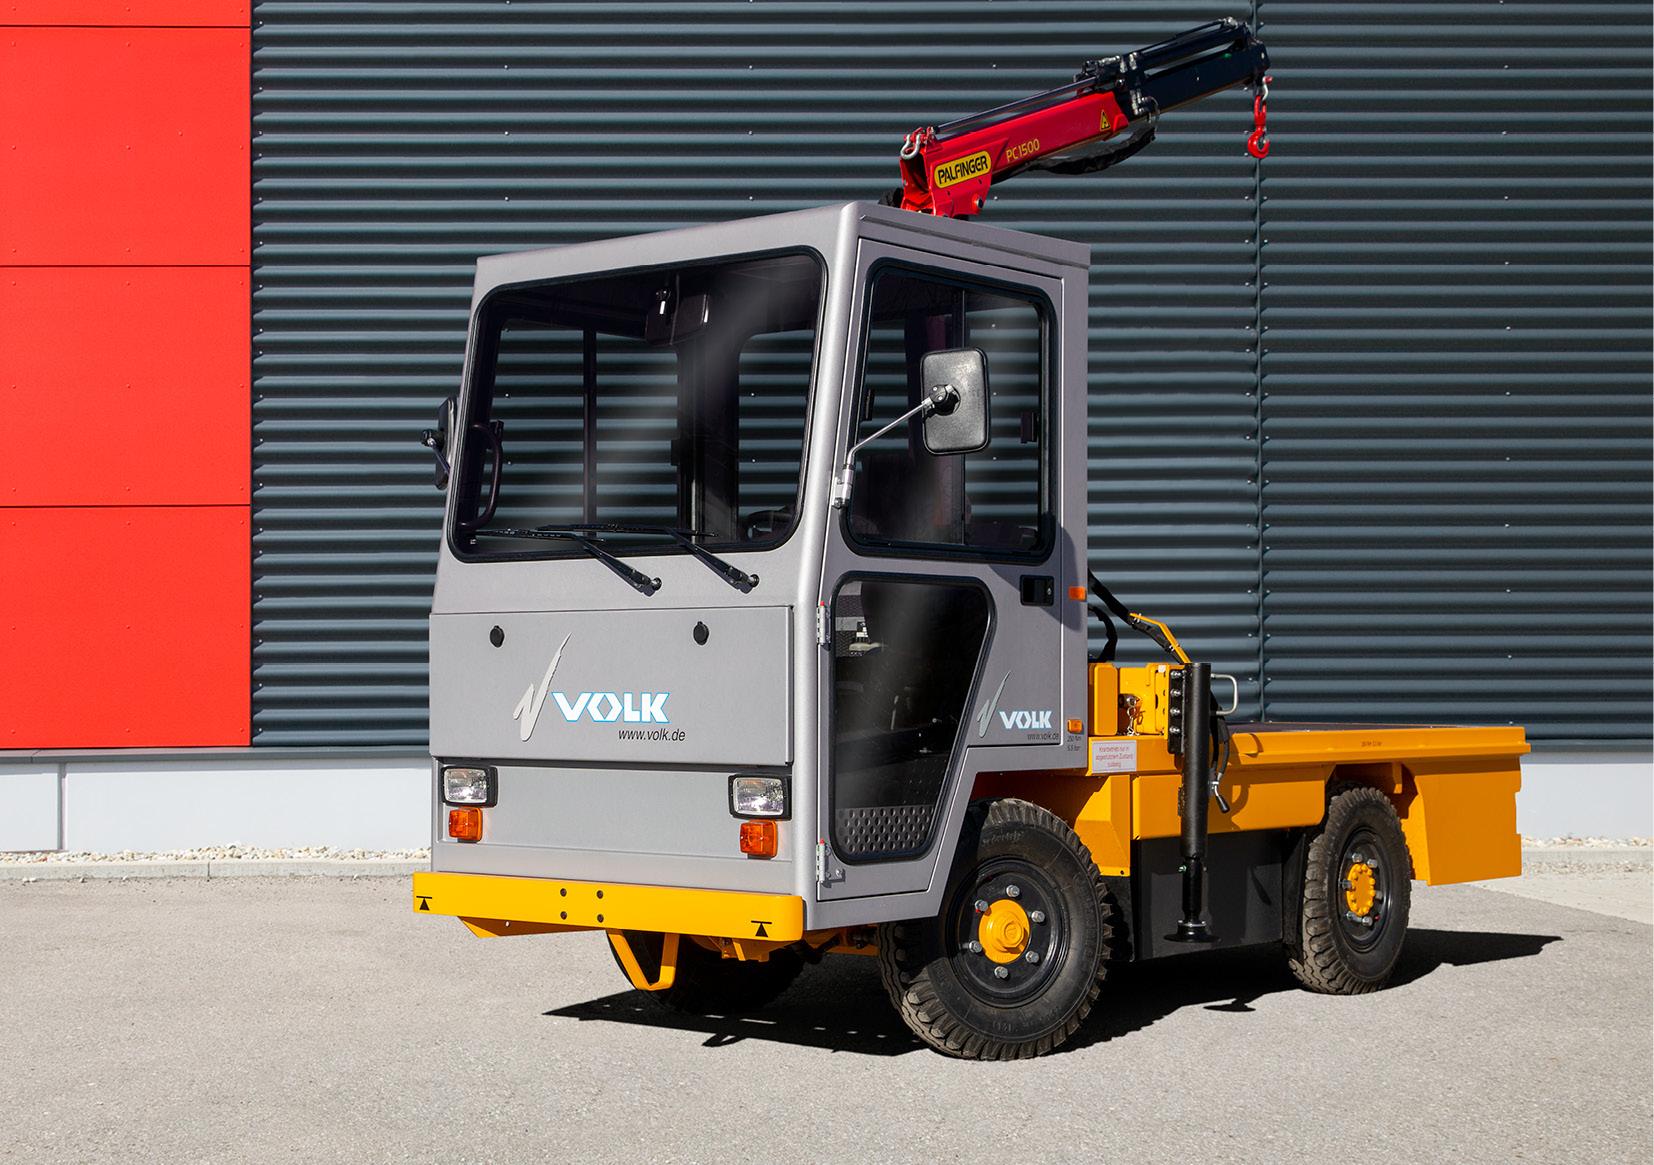 VOLK_Electric-platform-truck_EFW-2v7